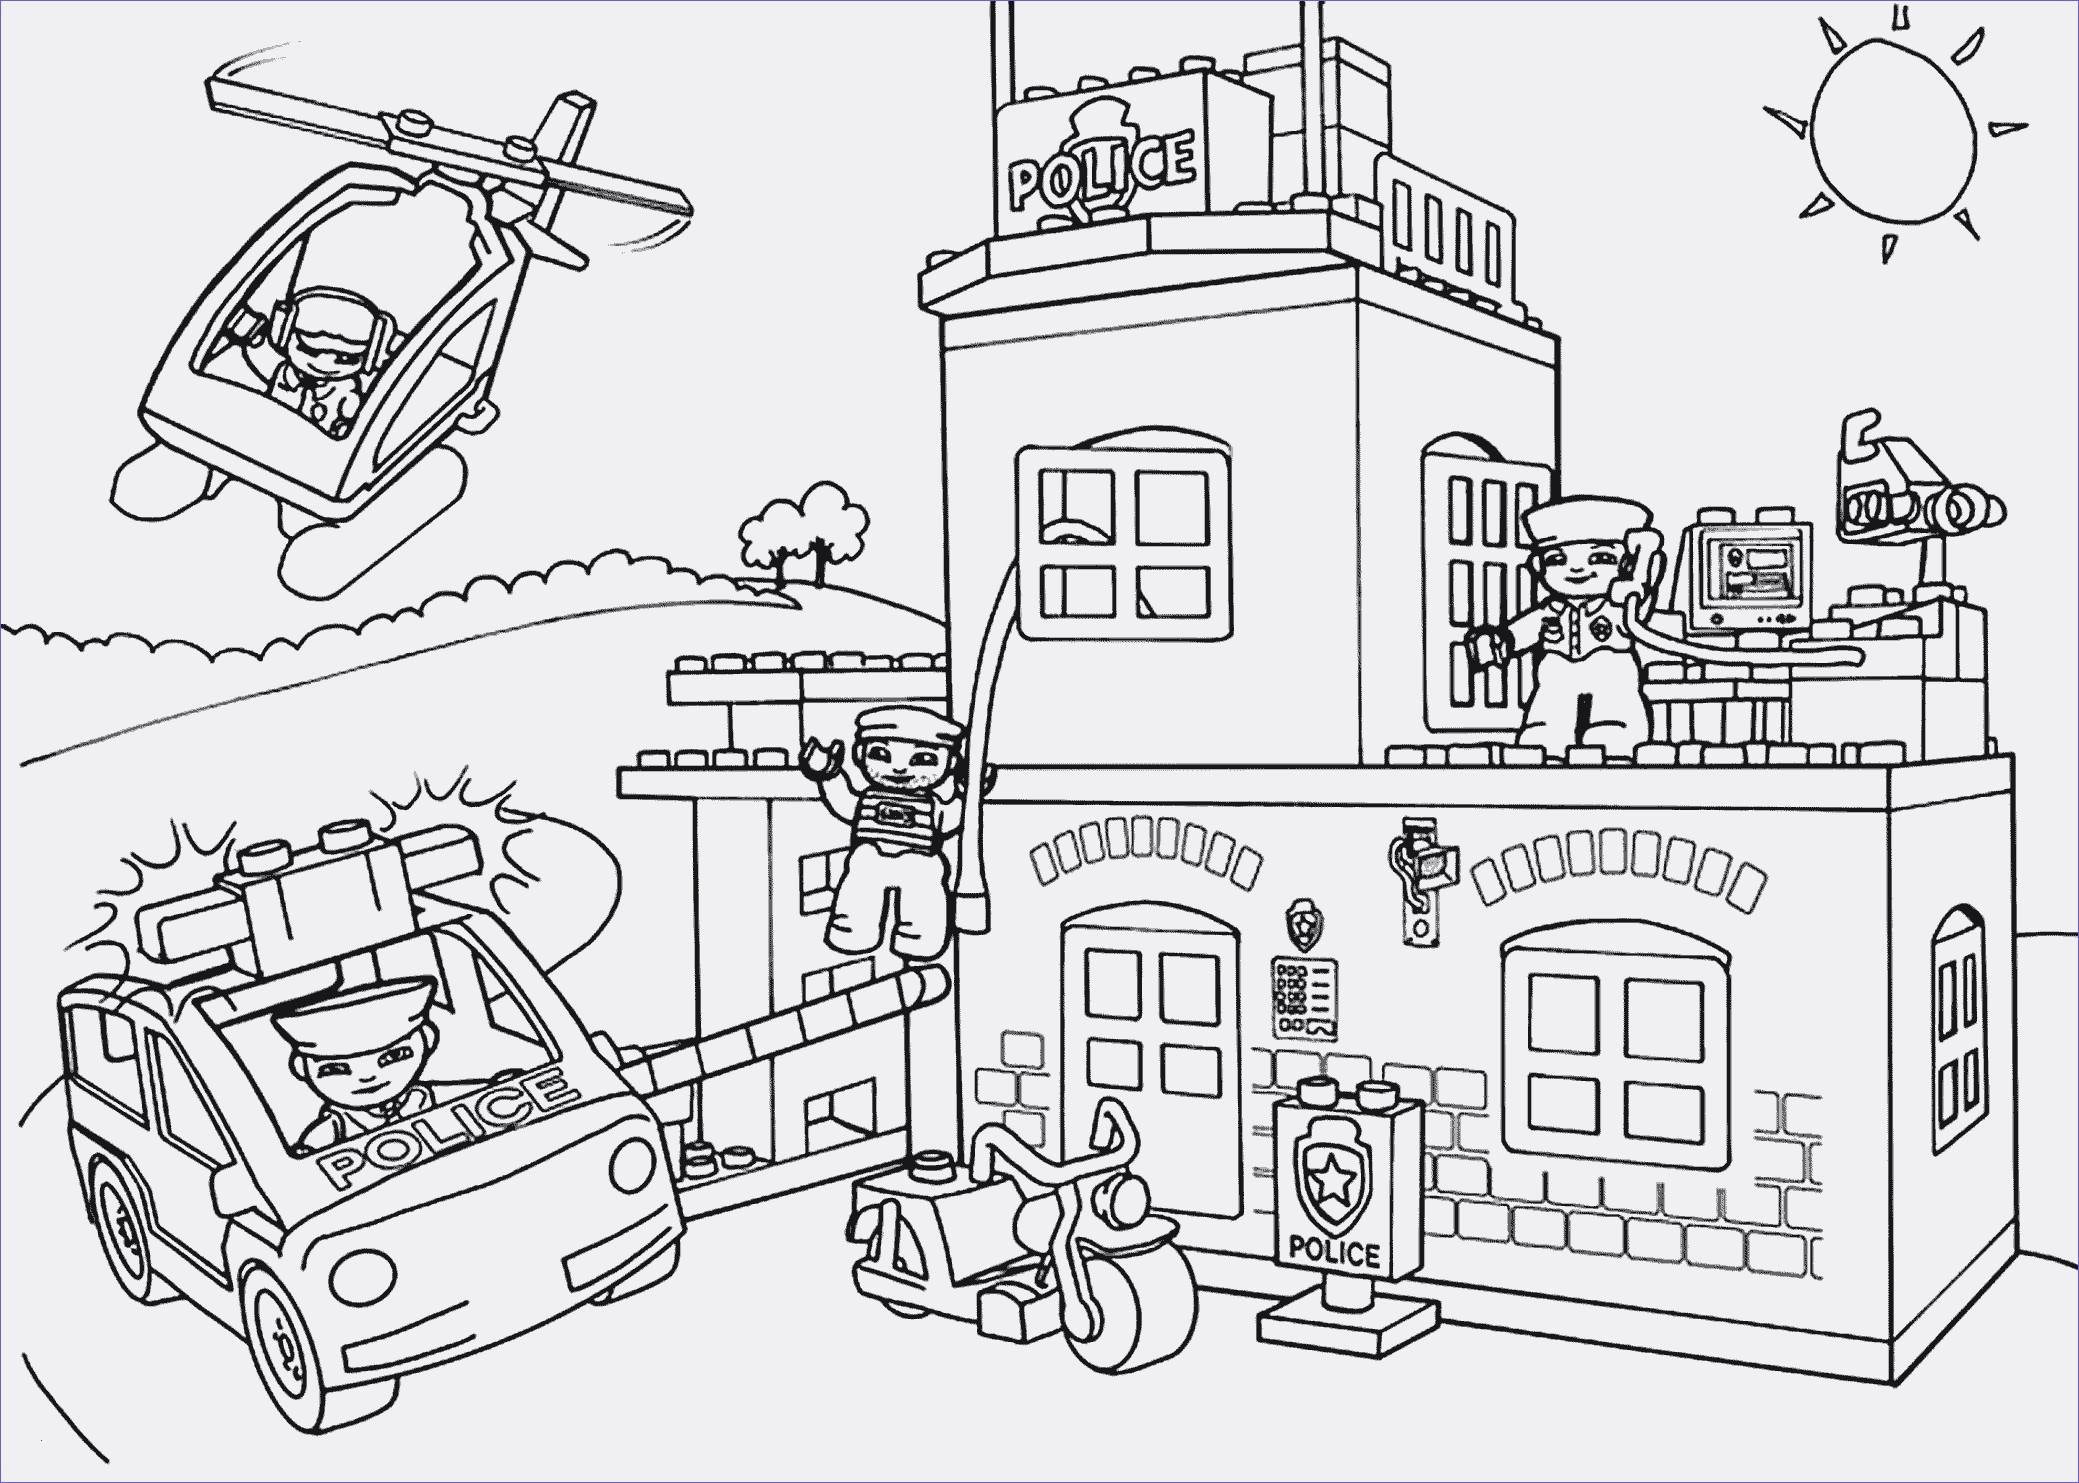 Lego Ninjago Bilder Zum Ausdrucken Inspirierend Bilder Zum Ausmalen Bekommen Ninjago Ausmalbilder Zum Ausdrucken Das Bild